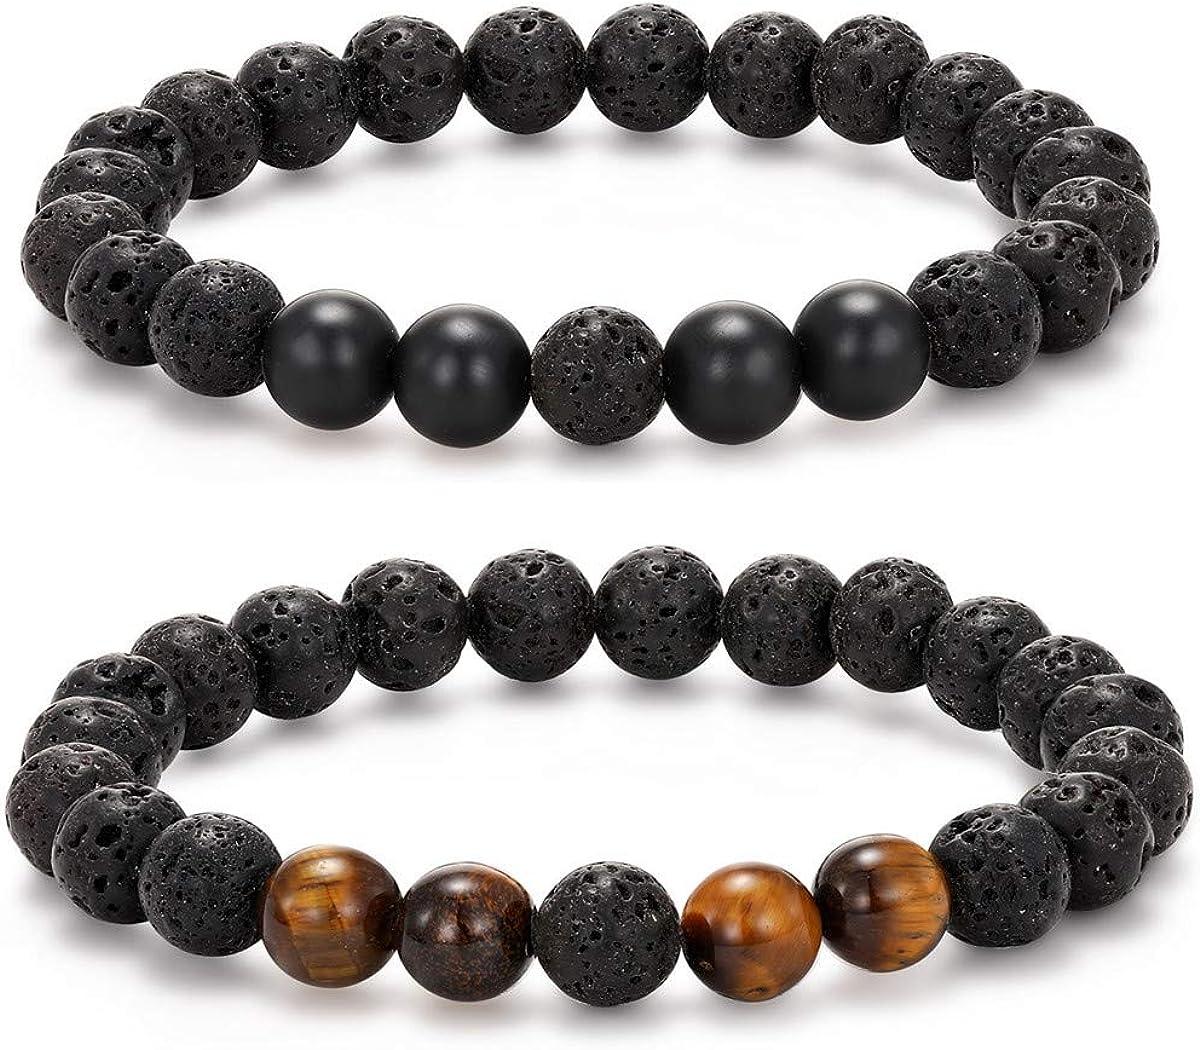 MengPa Lava Rock Bracelet Yoga Aromatherapy Anxiety Essential Oil Diffuser Volcanic Stone Bead Bangle for Women Men